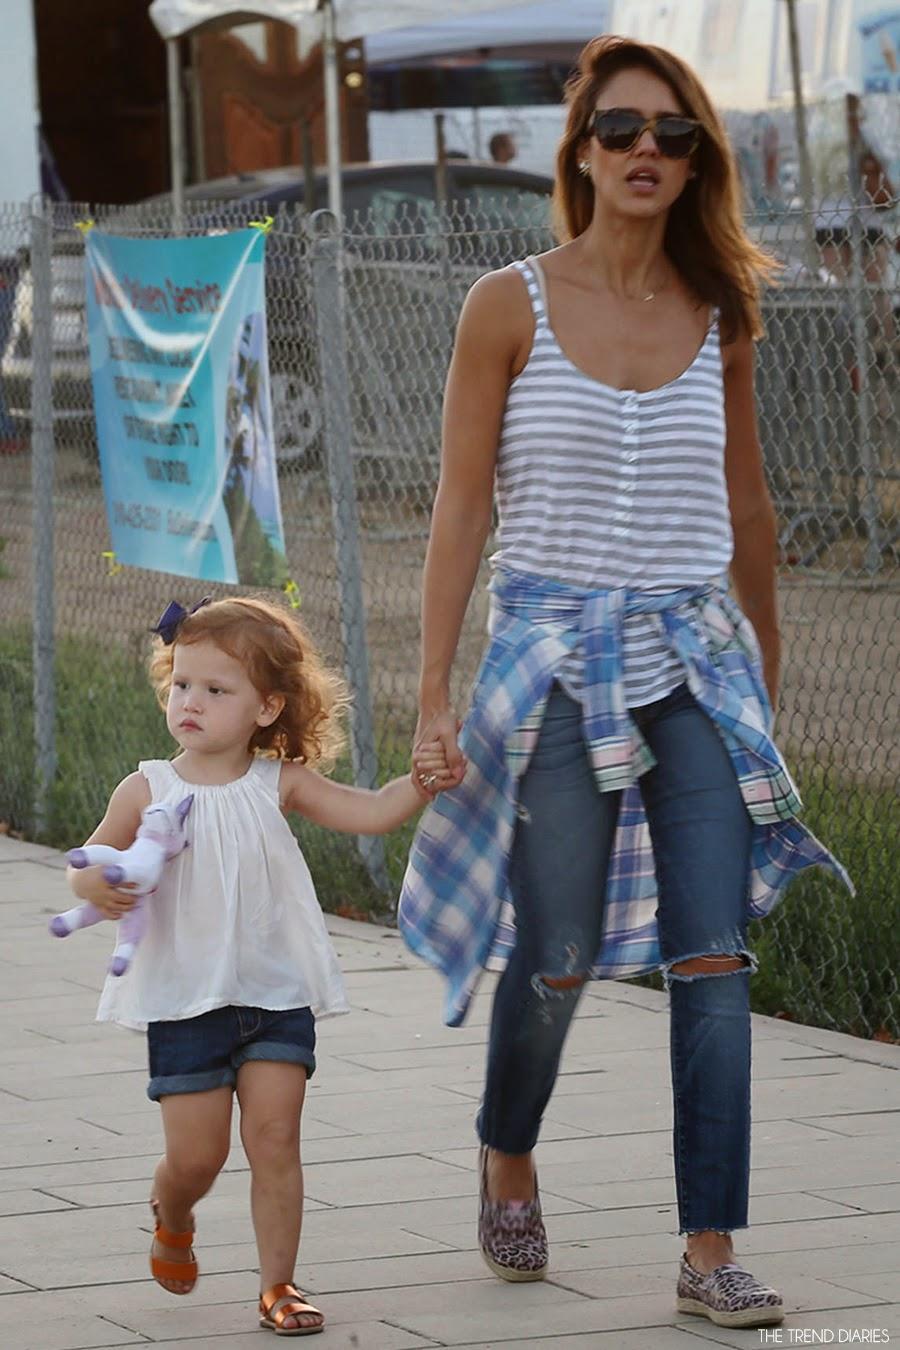 Jessica Alba At The Malibu Chili Cook Off In Malibu California September 1 2014 The Trend